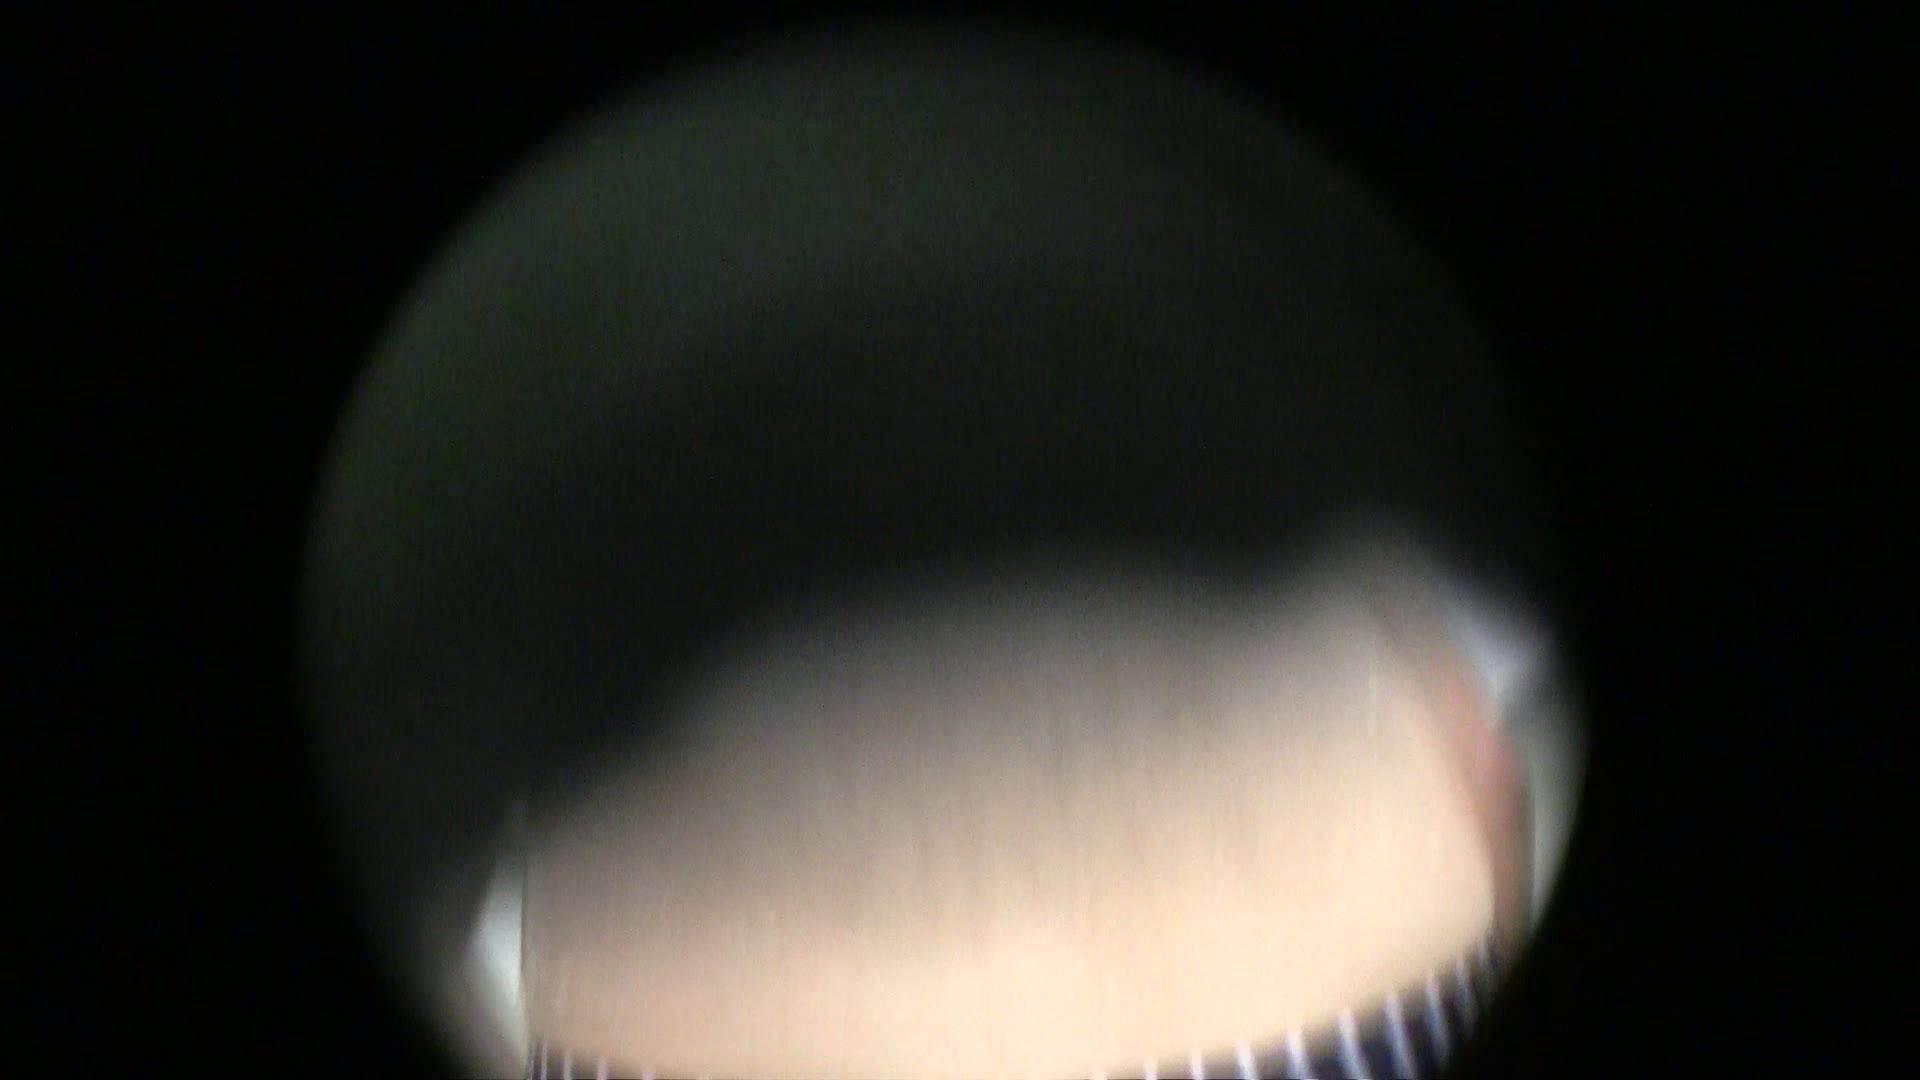 NO.43 乳首の先がチラ 背中でイメージして下さい シャワー 盗み撮りAV無料動画キャプチャ 45pic 23